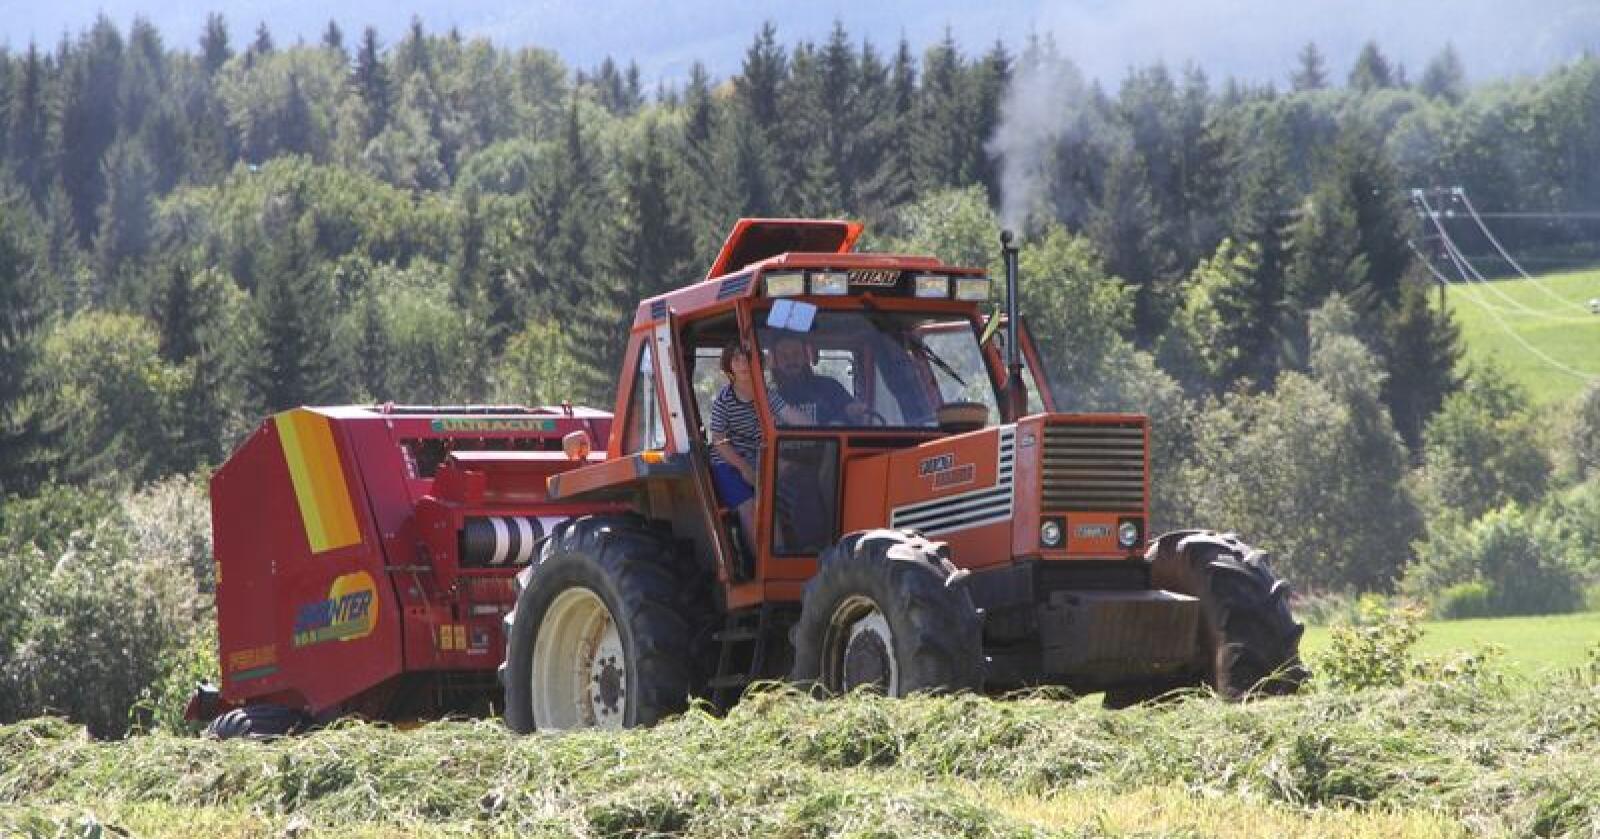 Italienske Fiat trollbandt den norske traktorkunden med sin solide kontruksjon og tiltalende design. (Foto: Arkivfoto, Traktor)